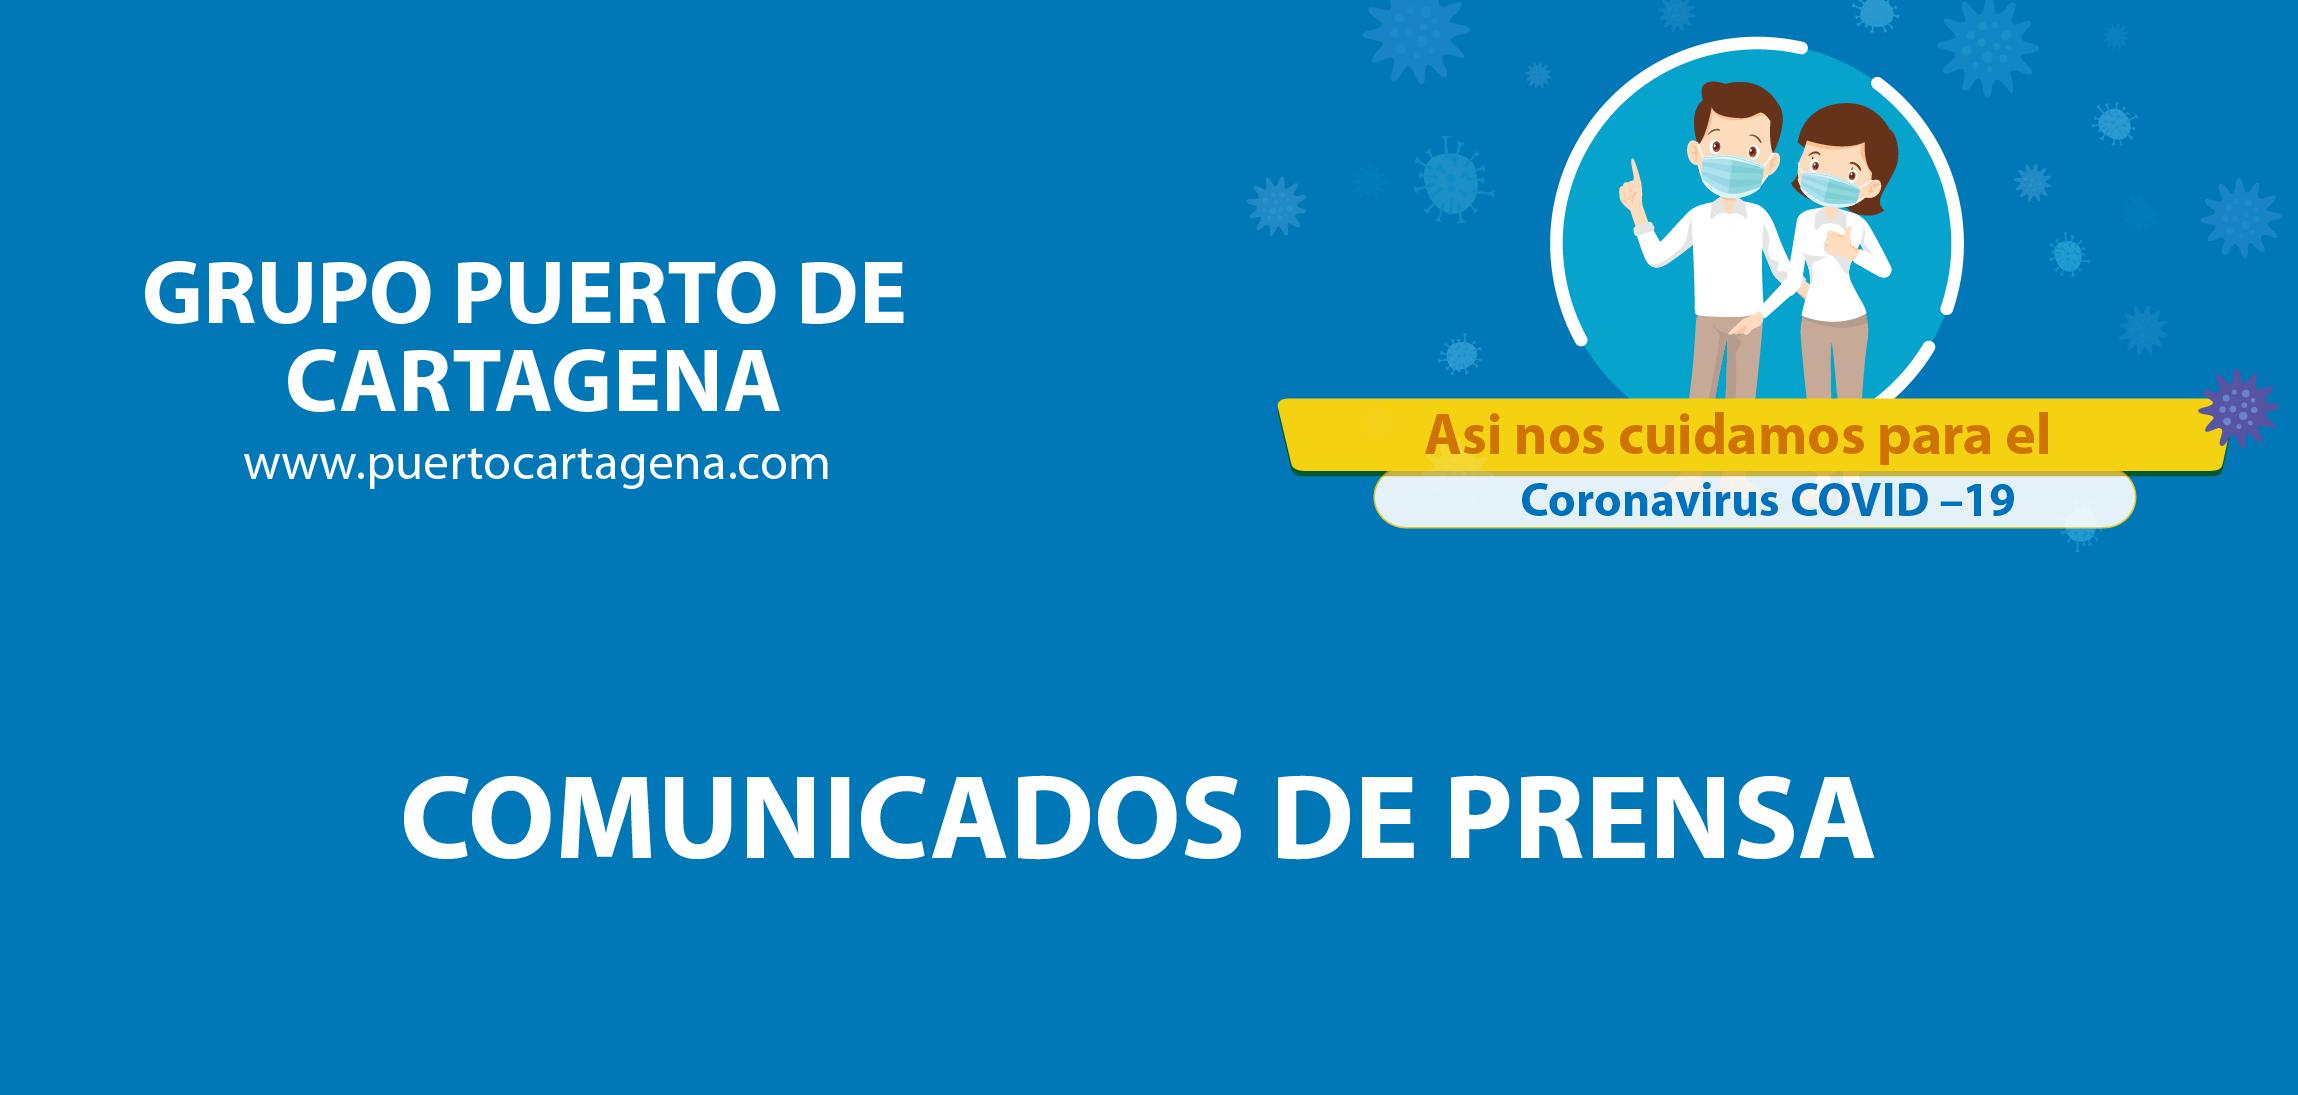 comunicados-prensa-covid-19